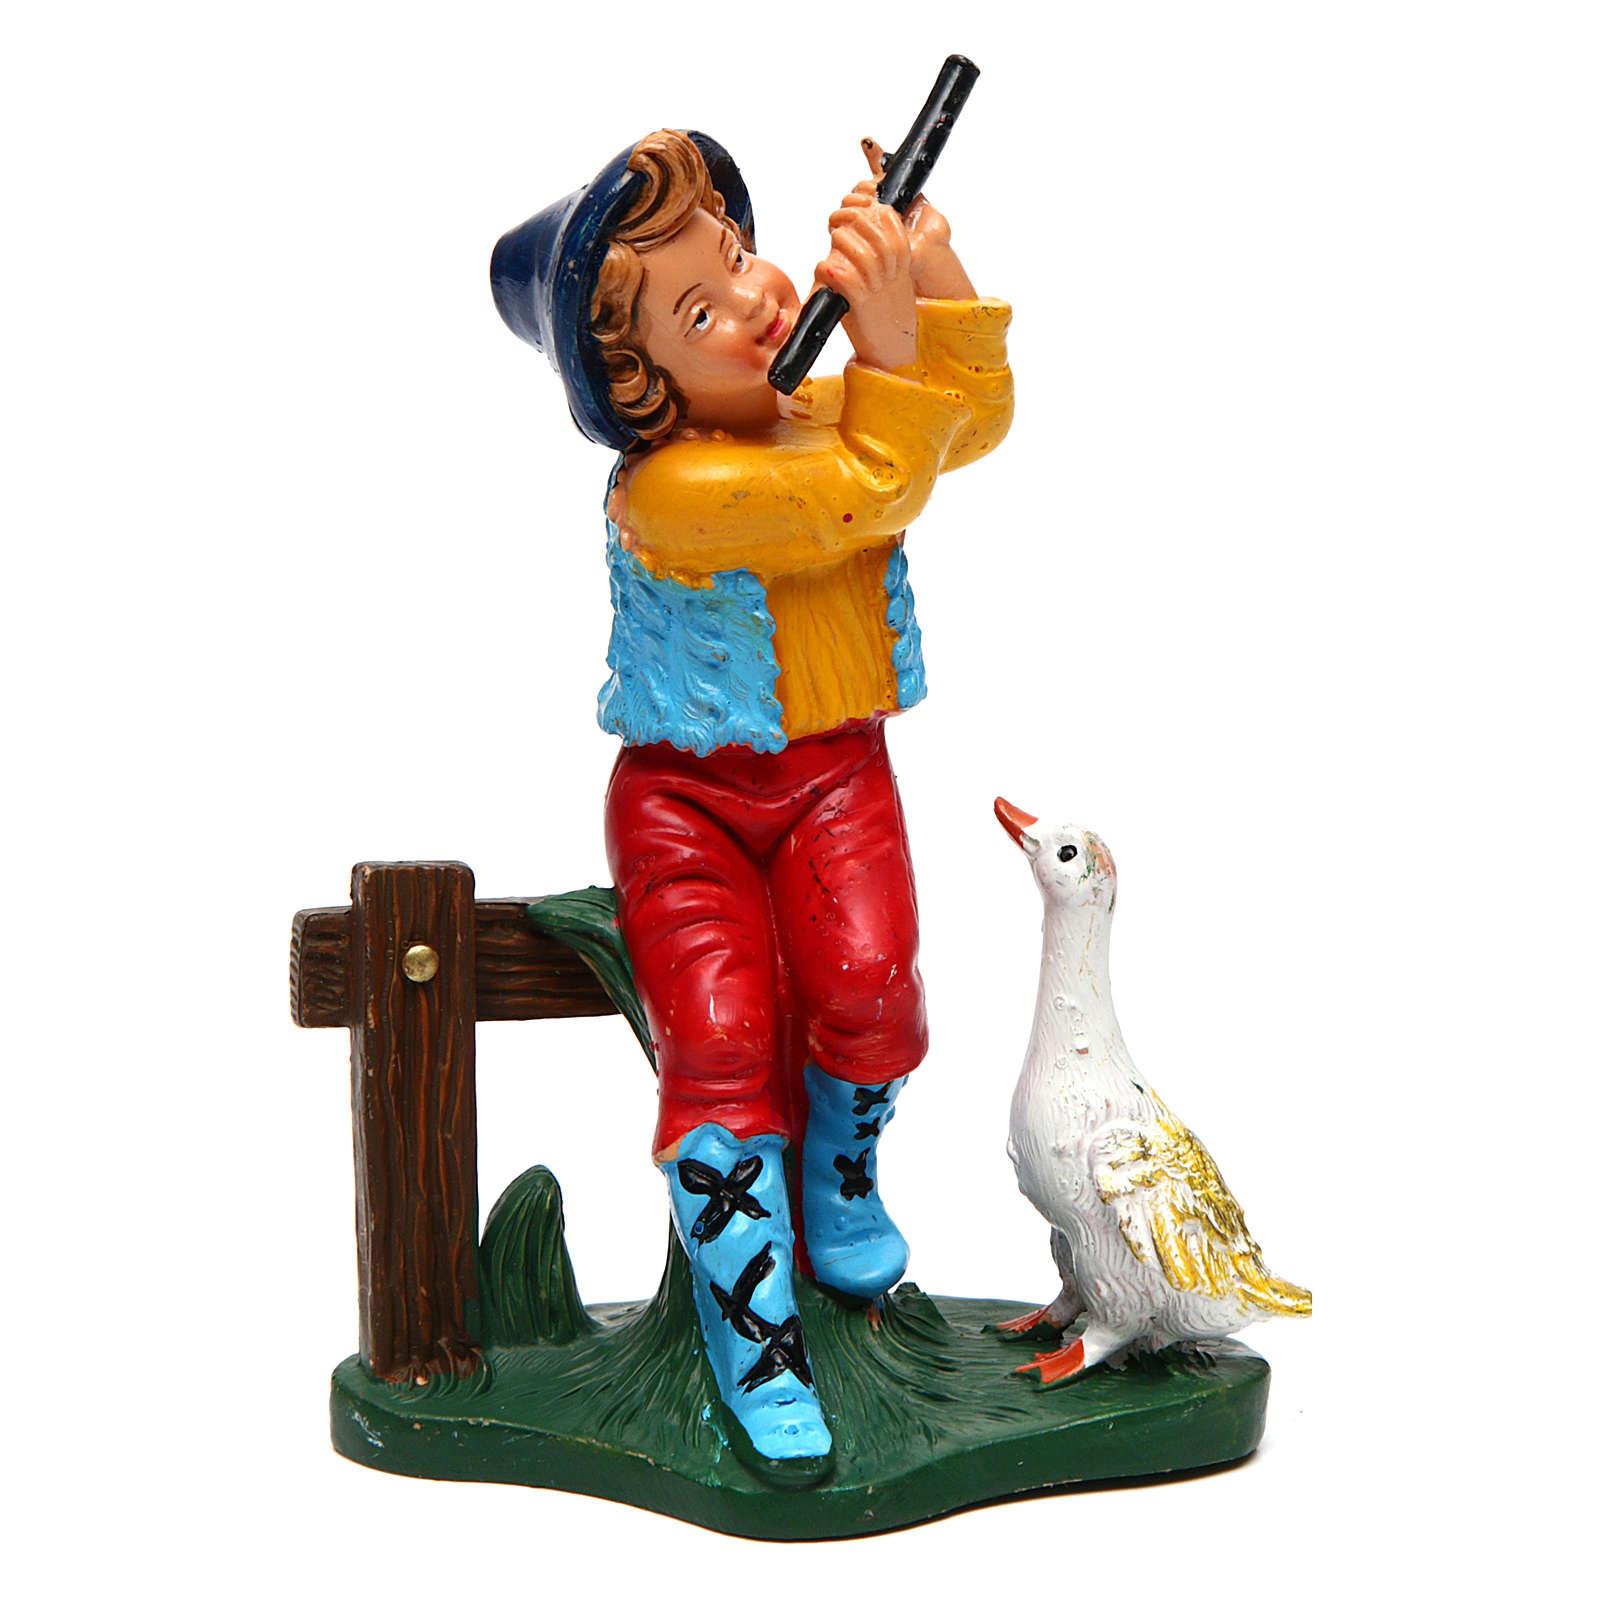 Hombre tocador con ganso de 12 cm de altura media belén 3